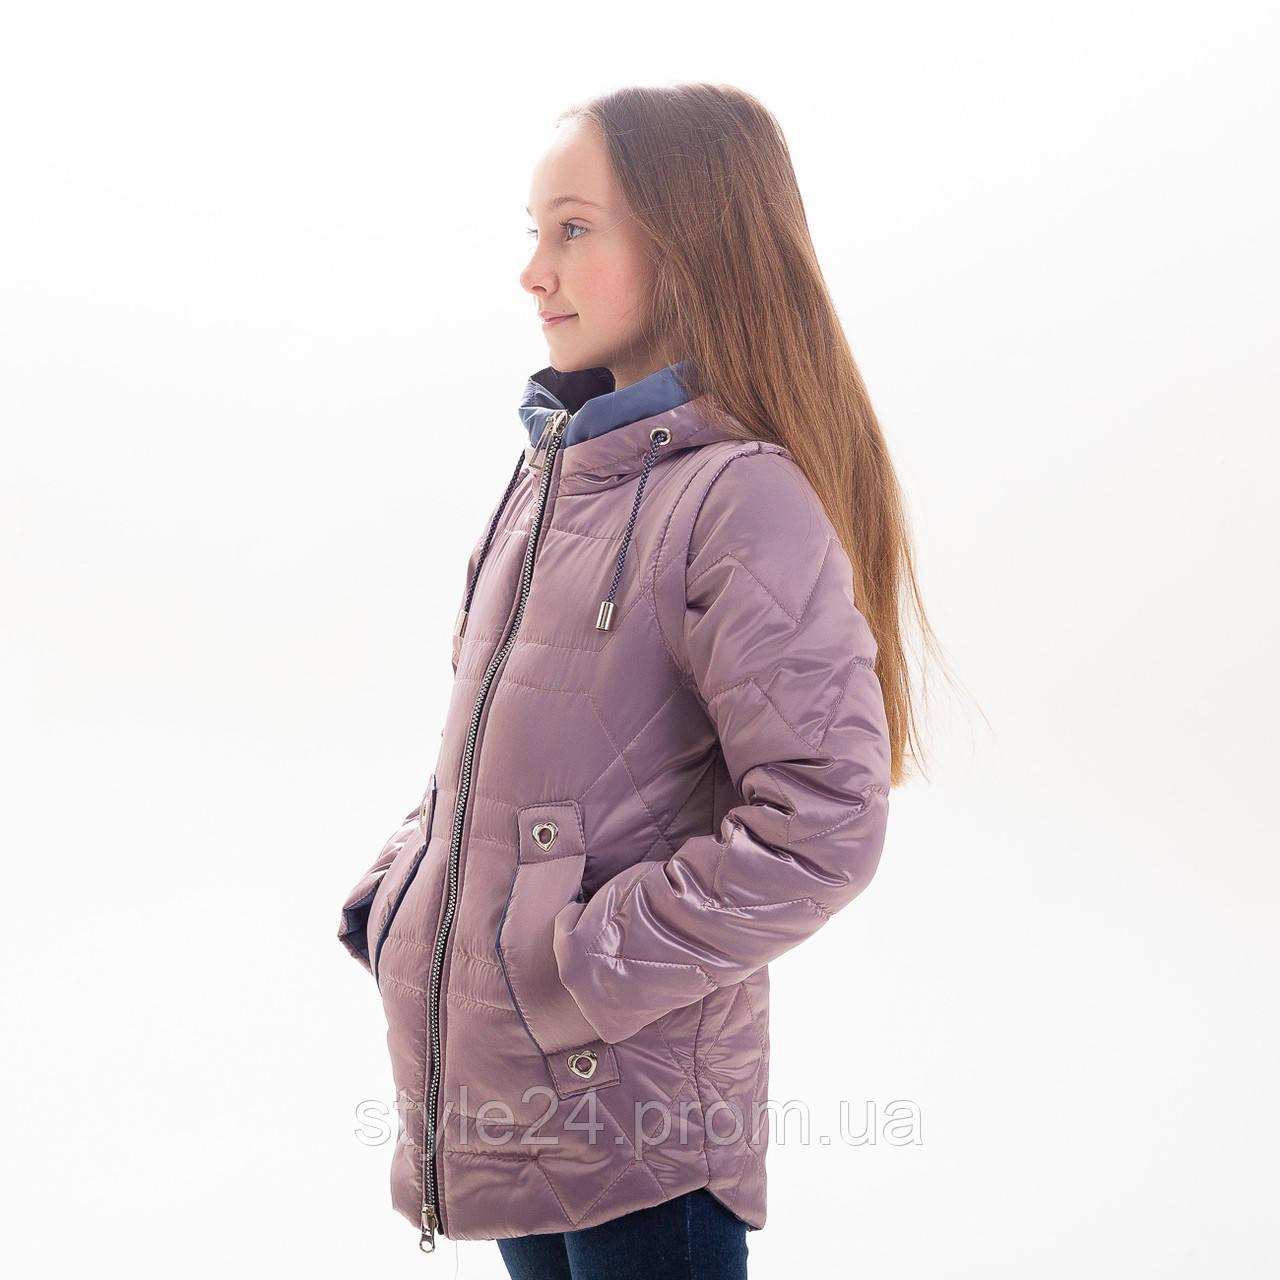 Весняна куртка-жилетка на дівчинку ростом 122-152 a56e3dc5d5020